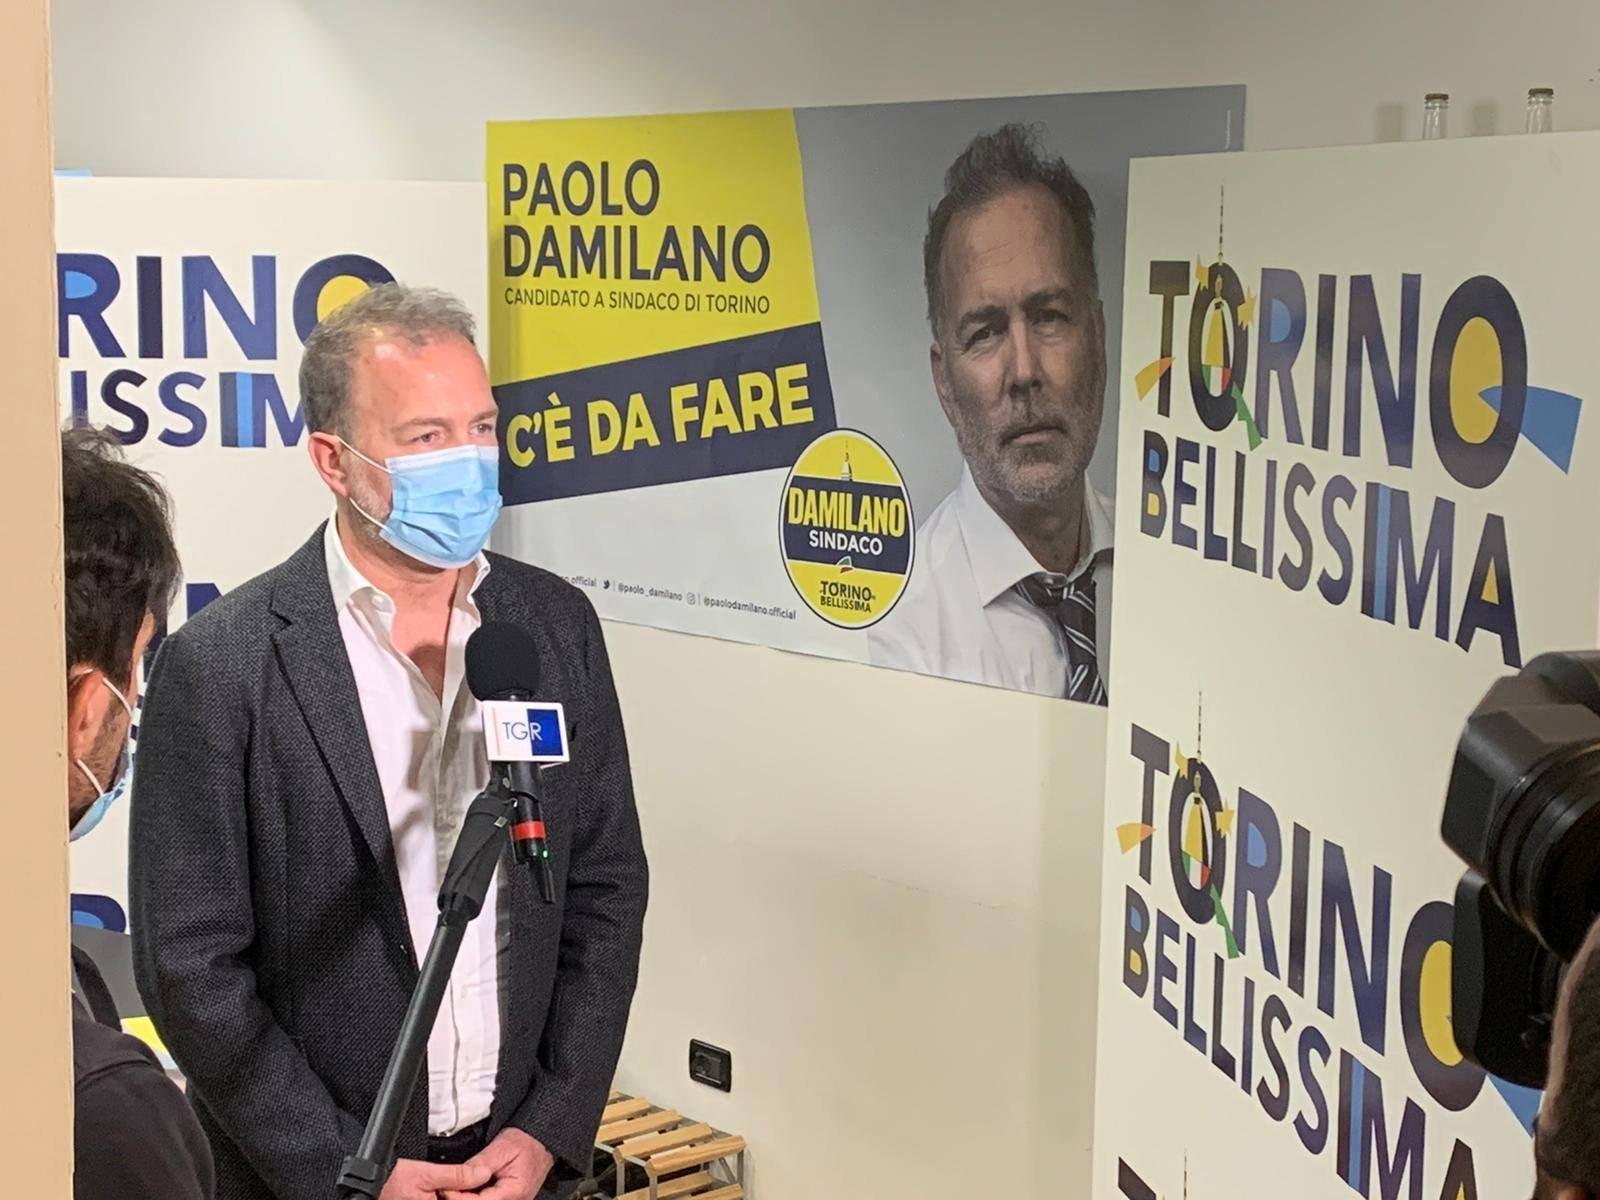 Paolo Damilano Amministrative Torino